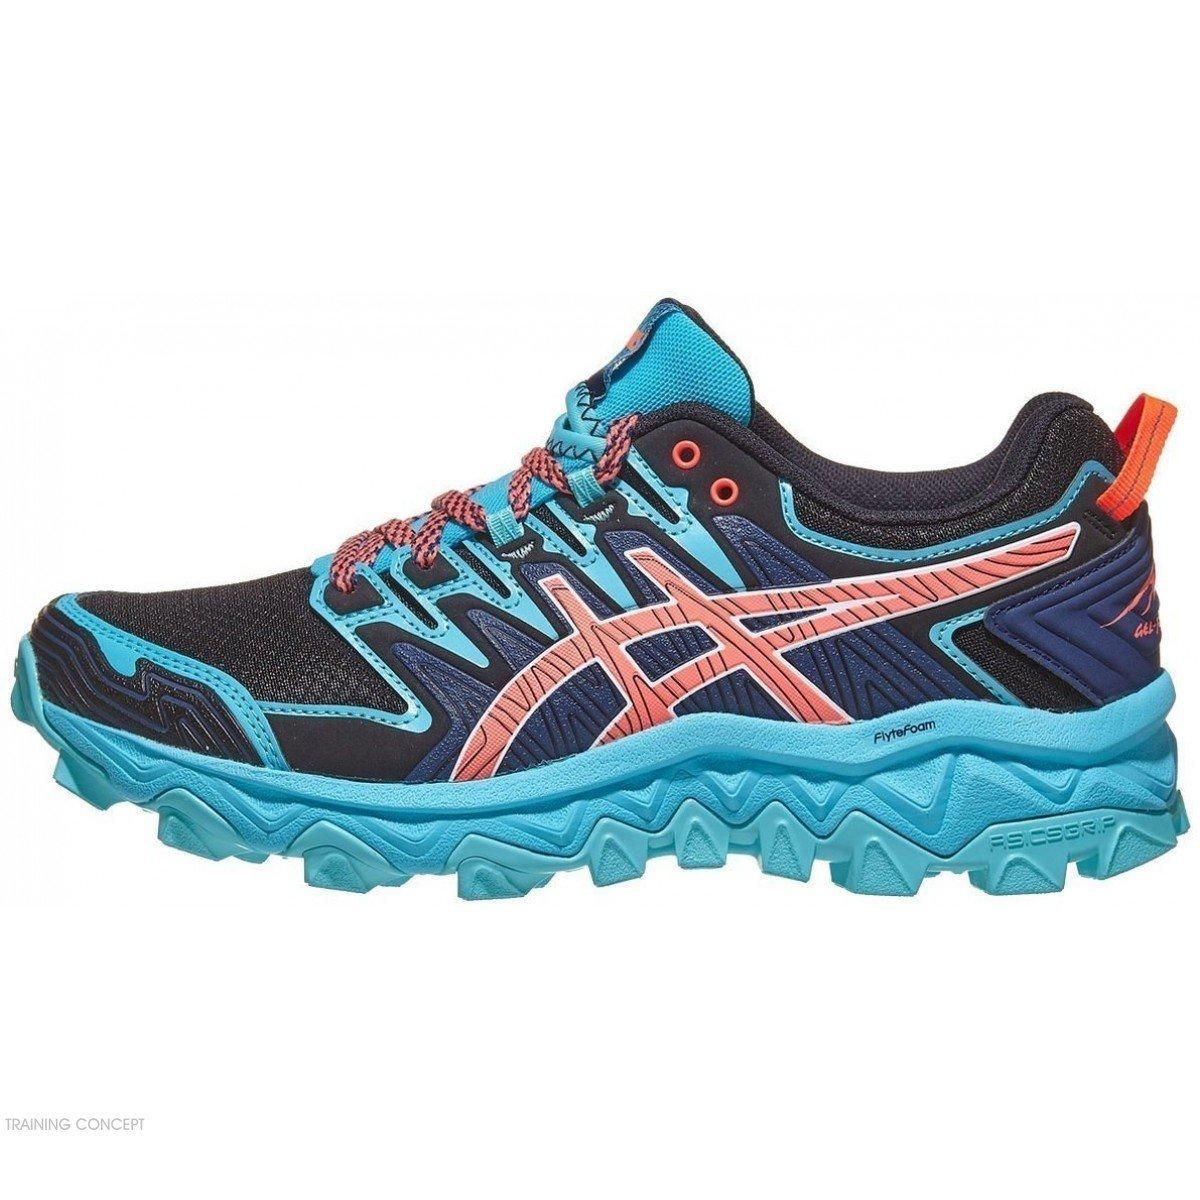 chaussure de trail running asics gel fuji trabuco 7 1012a180